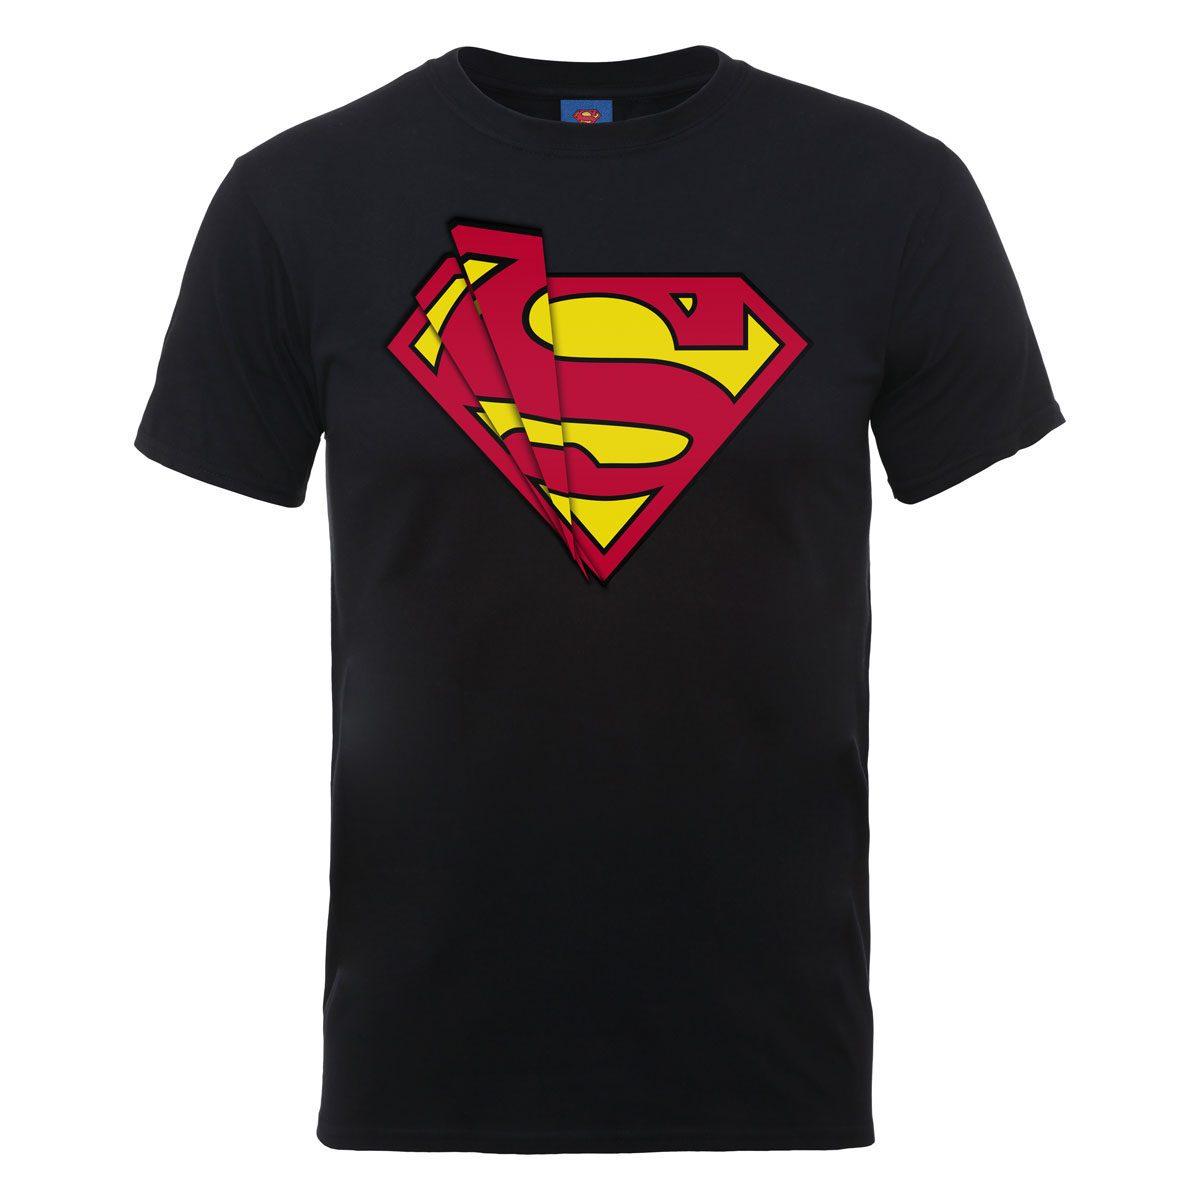 DC Comics T-Shirt Superman Glass Logo Size XL